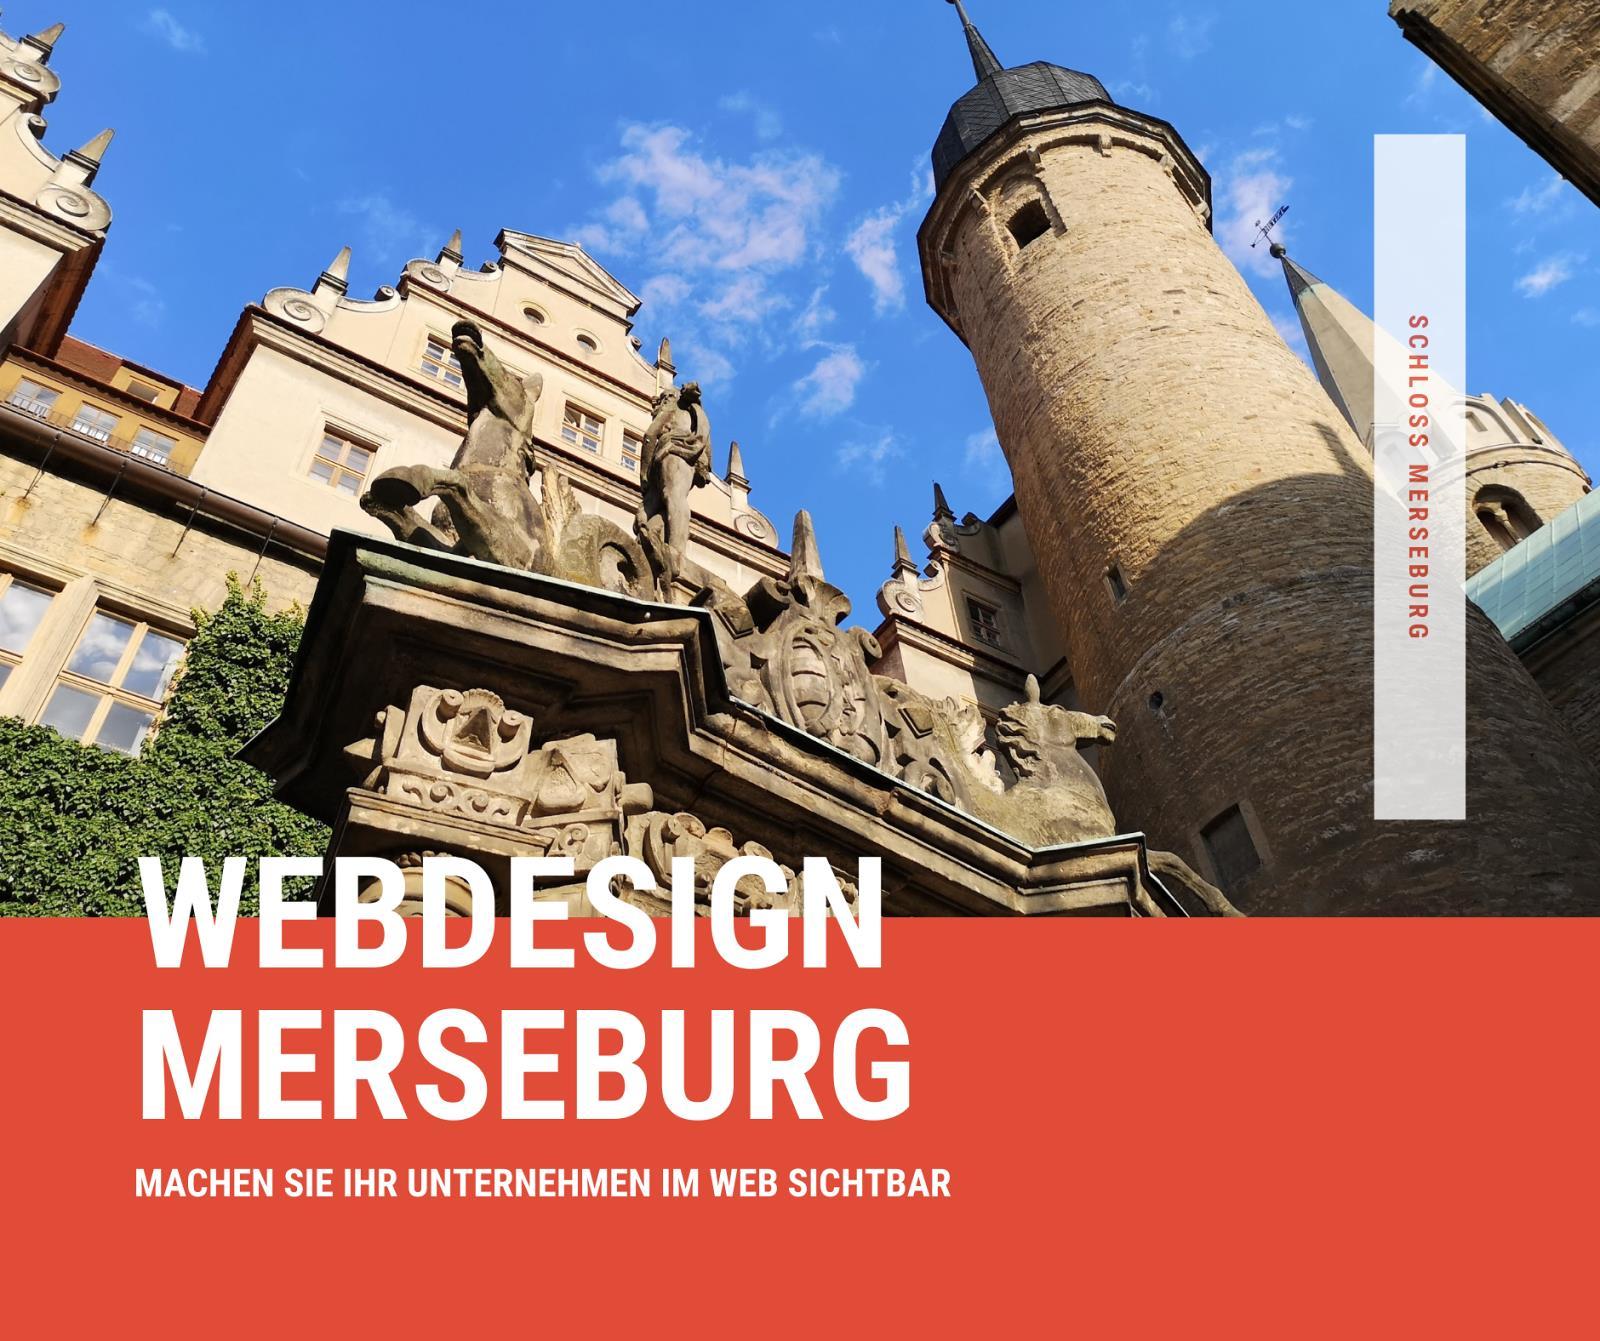 Webdesign Merseburg